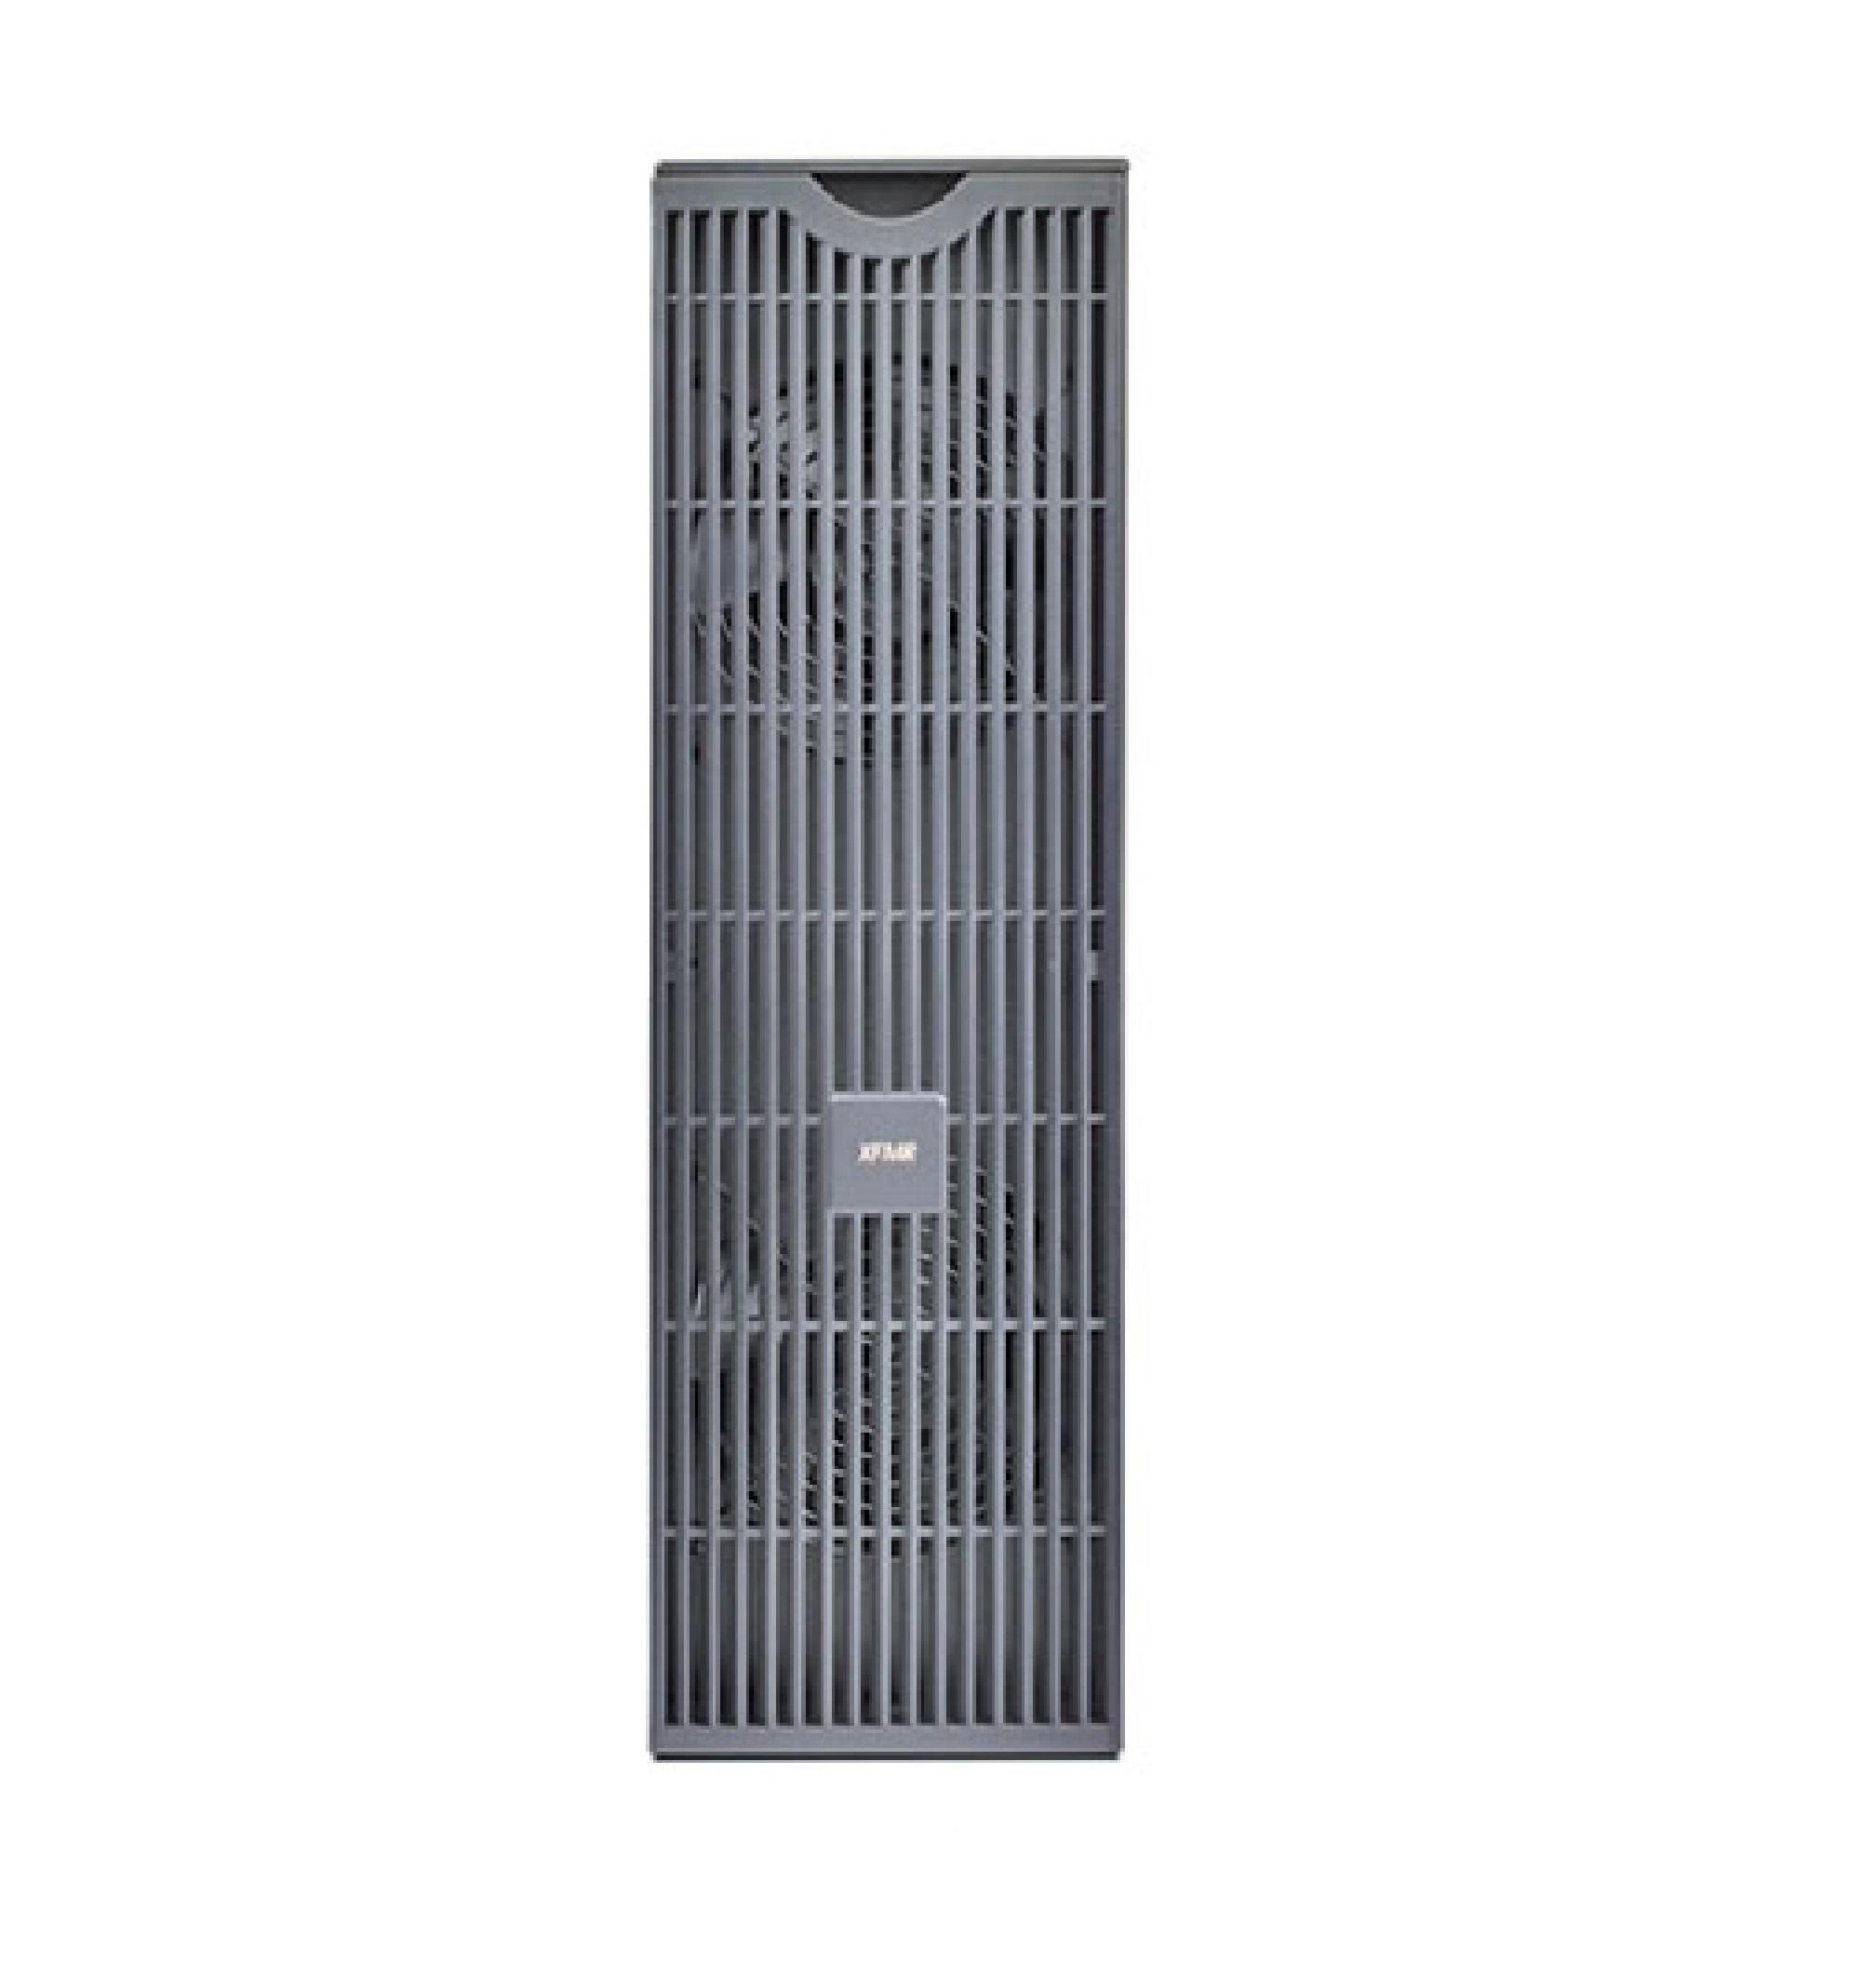 Transformador de isolamento/redutor para nobreak inteligente Smart-UPS RT torre